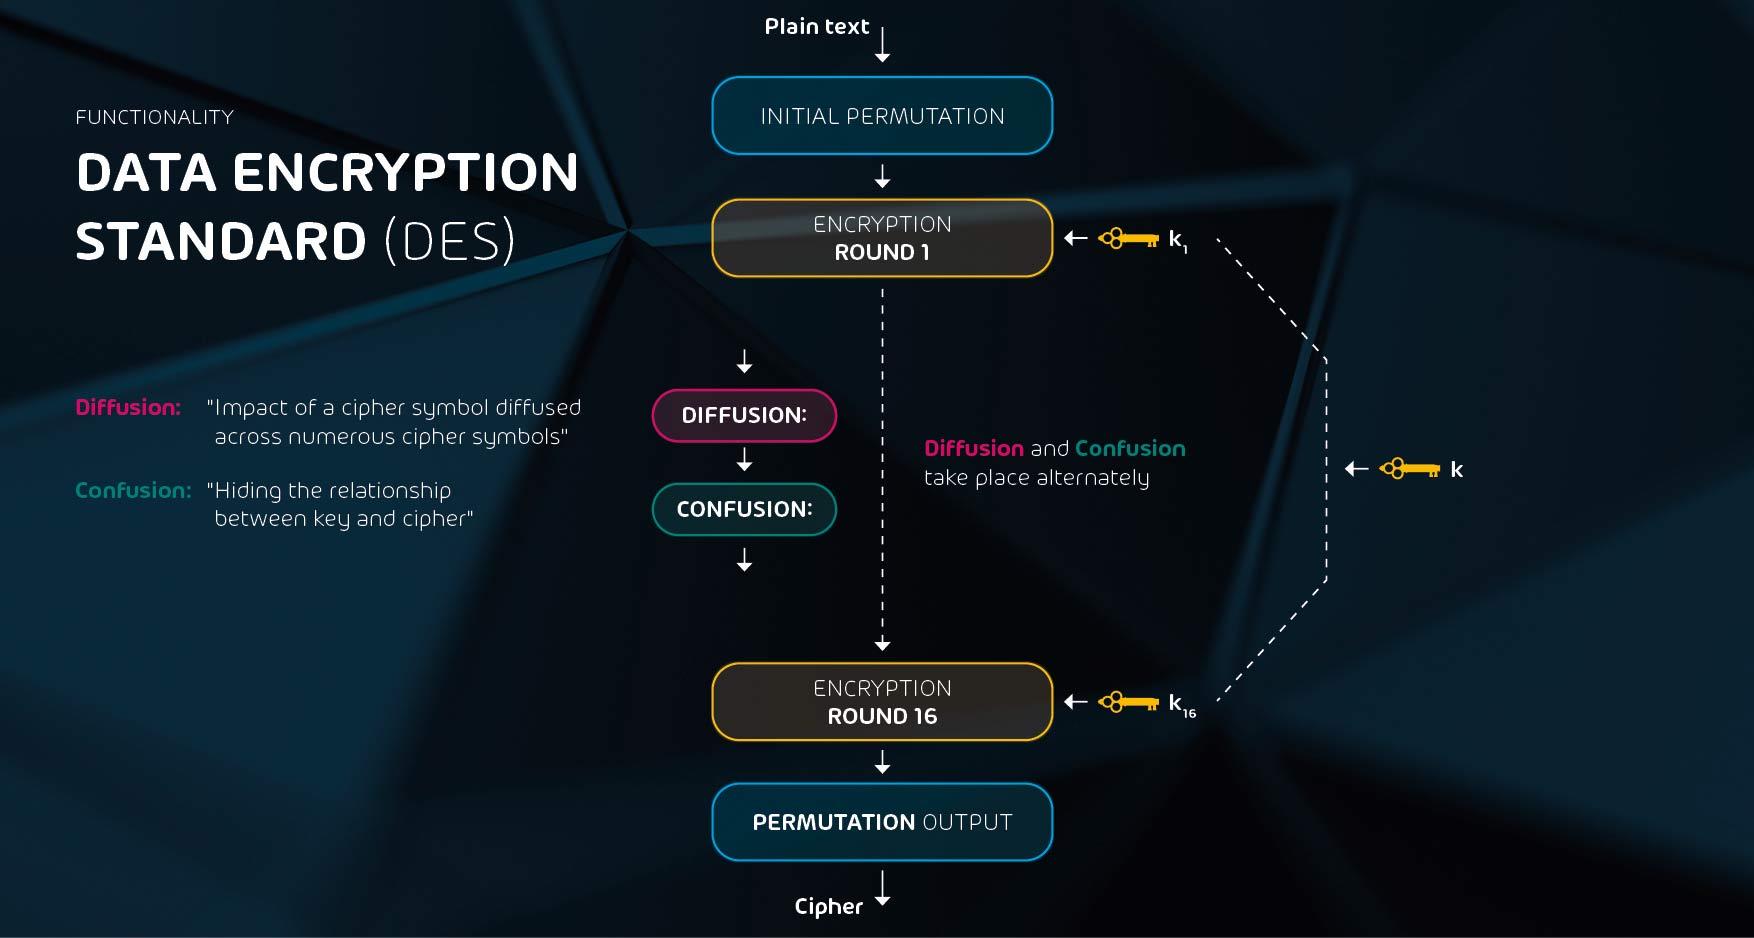 Die Funktionsweise des Data Encryption Standards